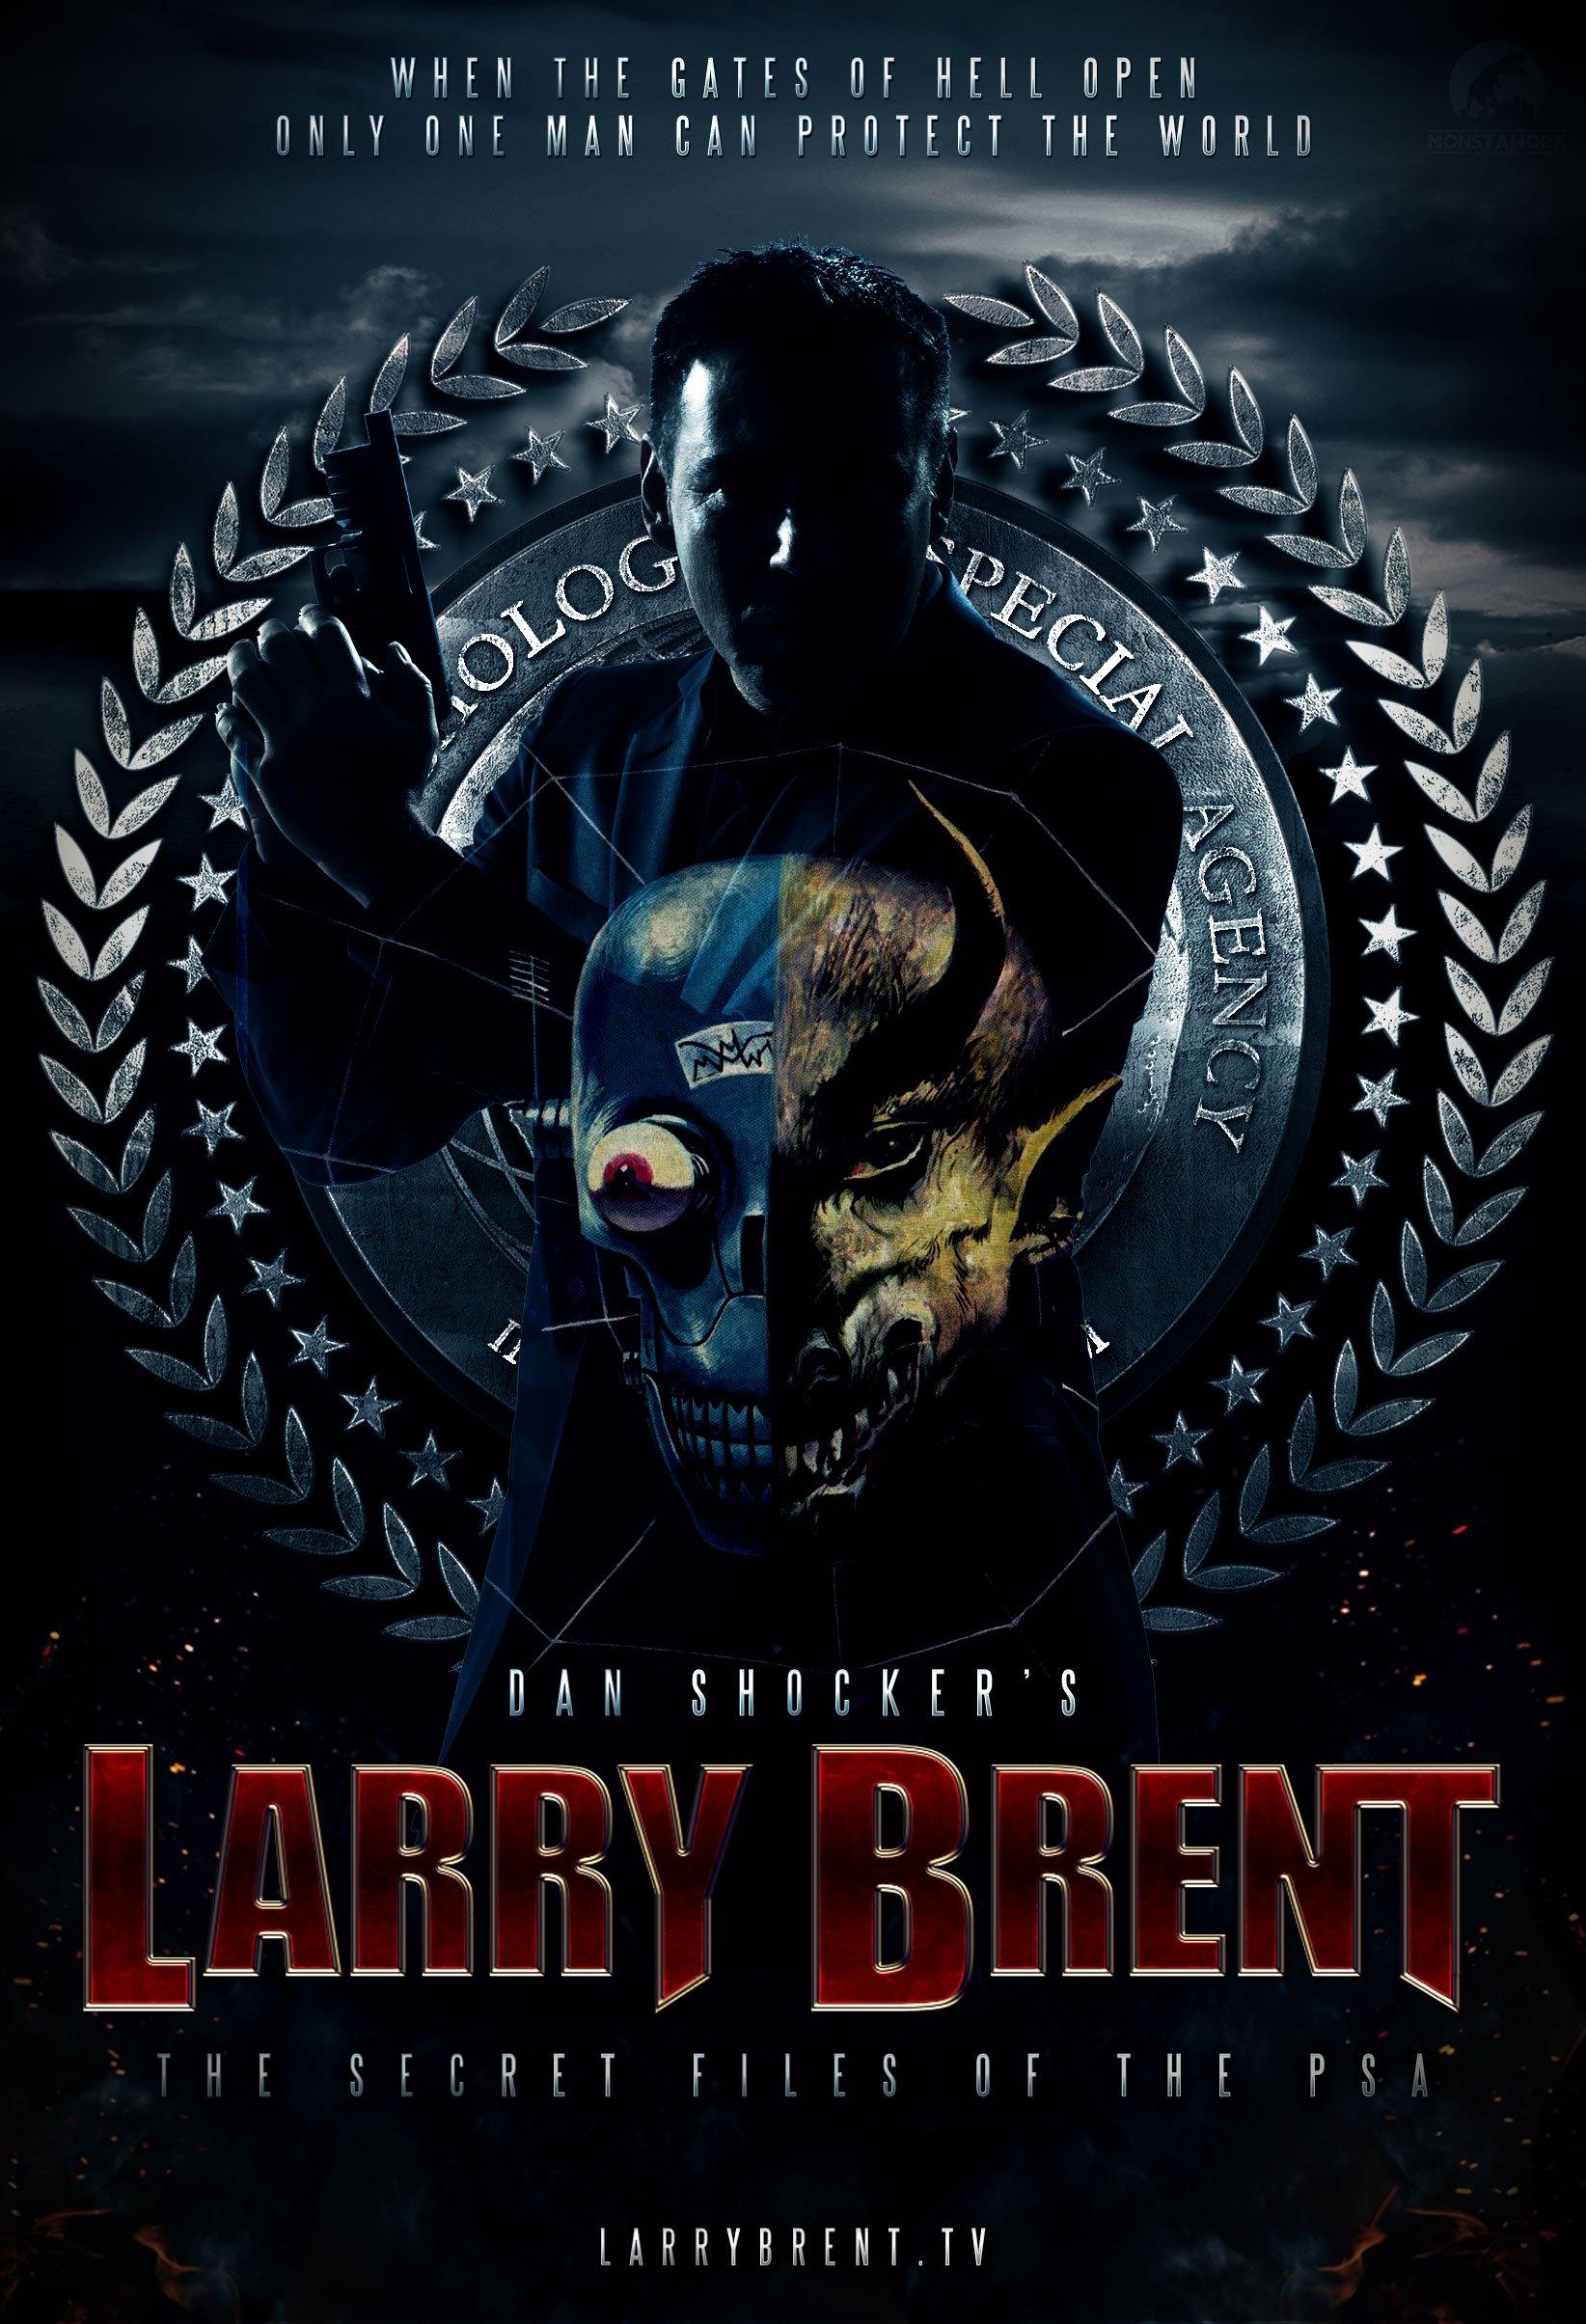 Larry Brent: The Secret Files of the PSA